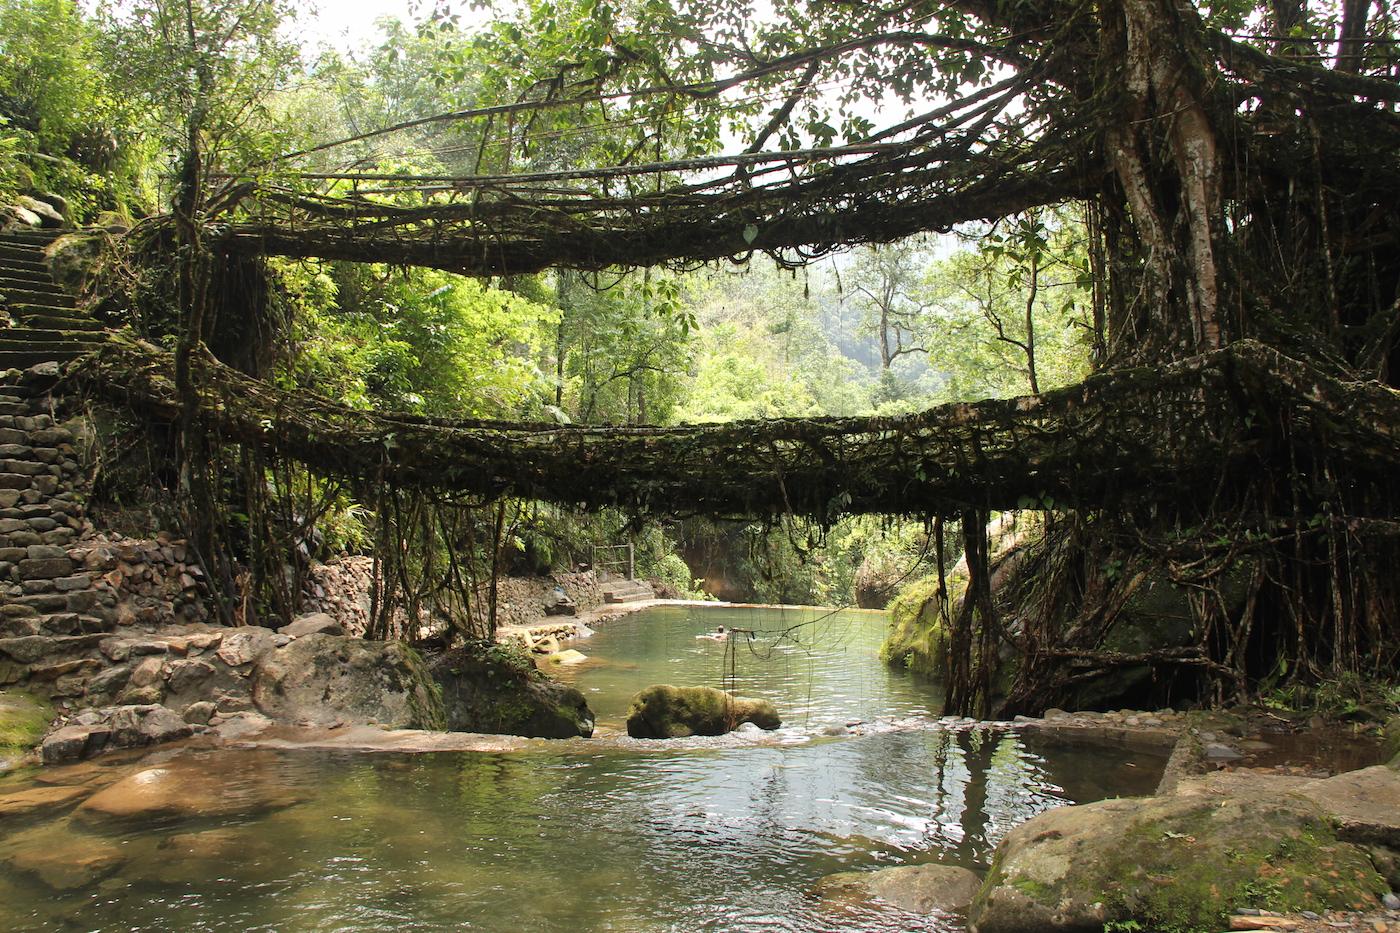 Living Root Bridges, Nongriat village, Meghalaya